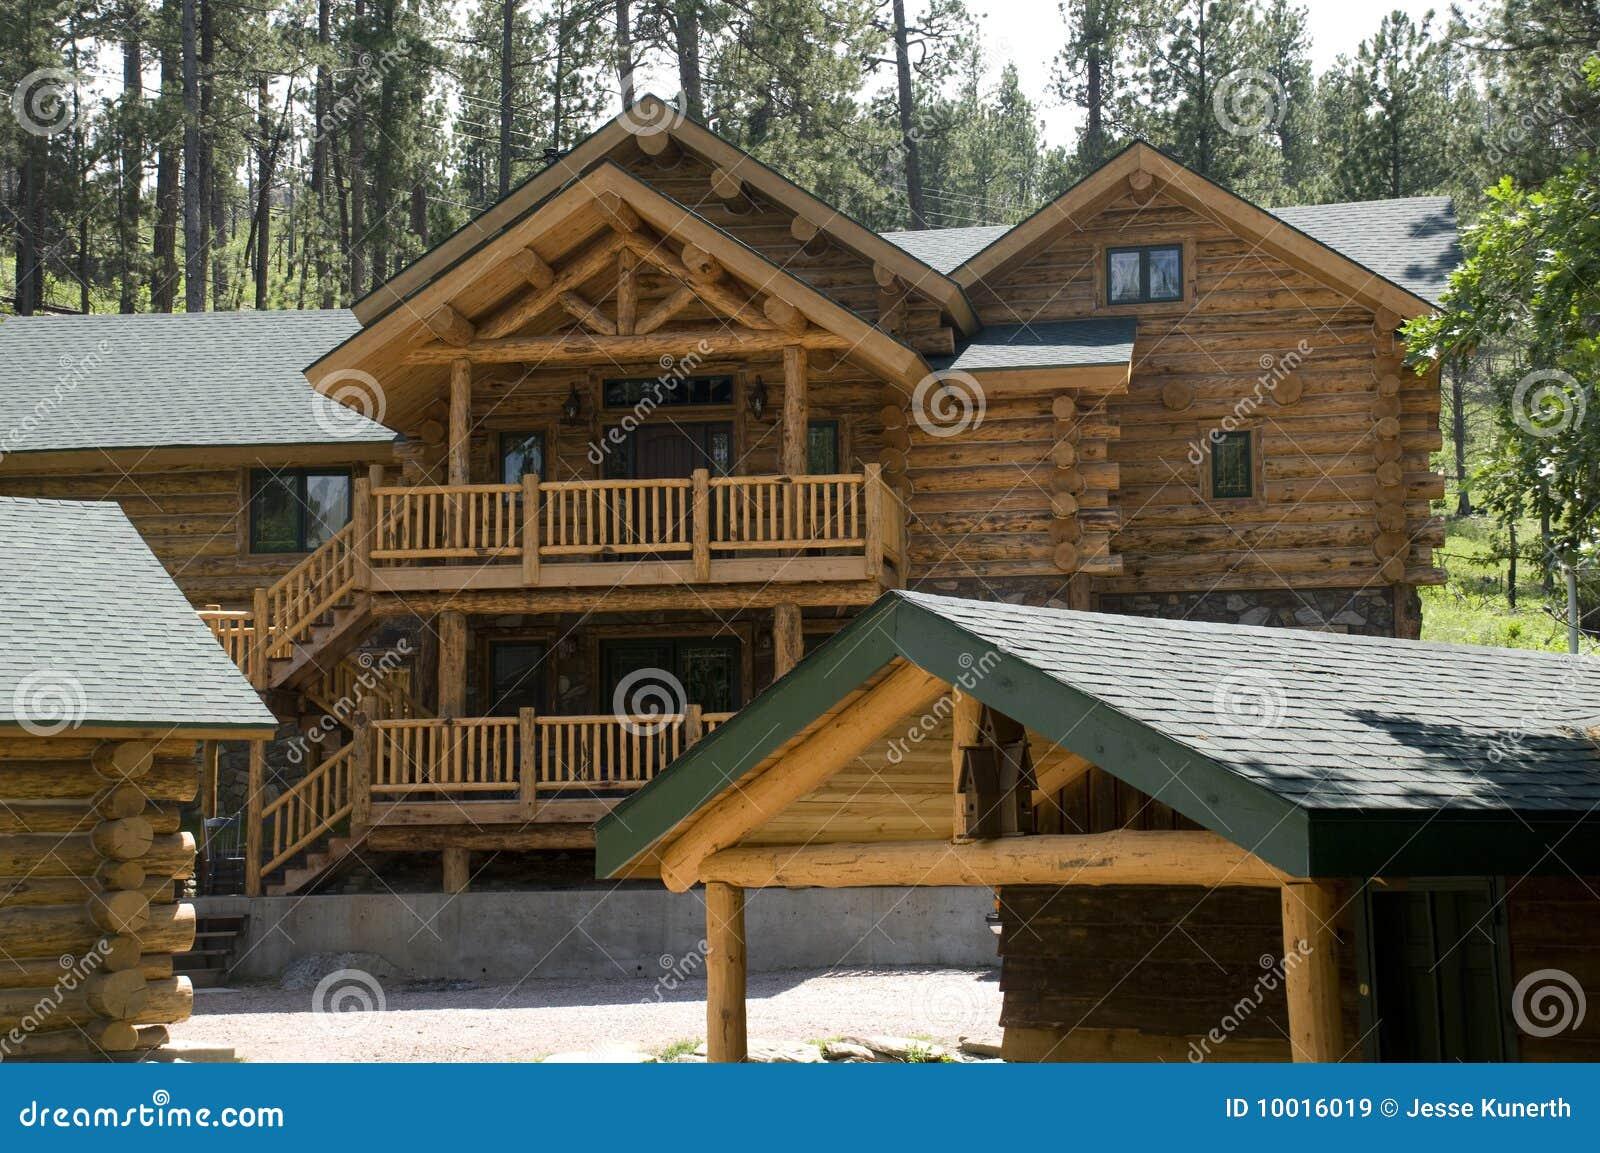 major a david scott kay interior park dakota lodging parks badlands in cabins upgrade south national badl of and the new